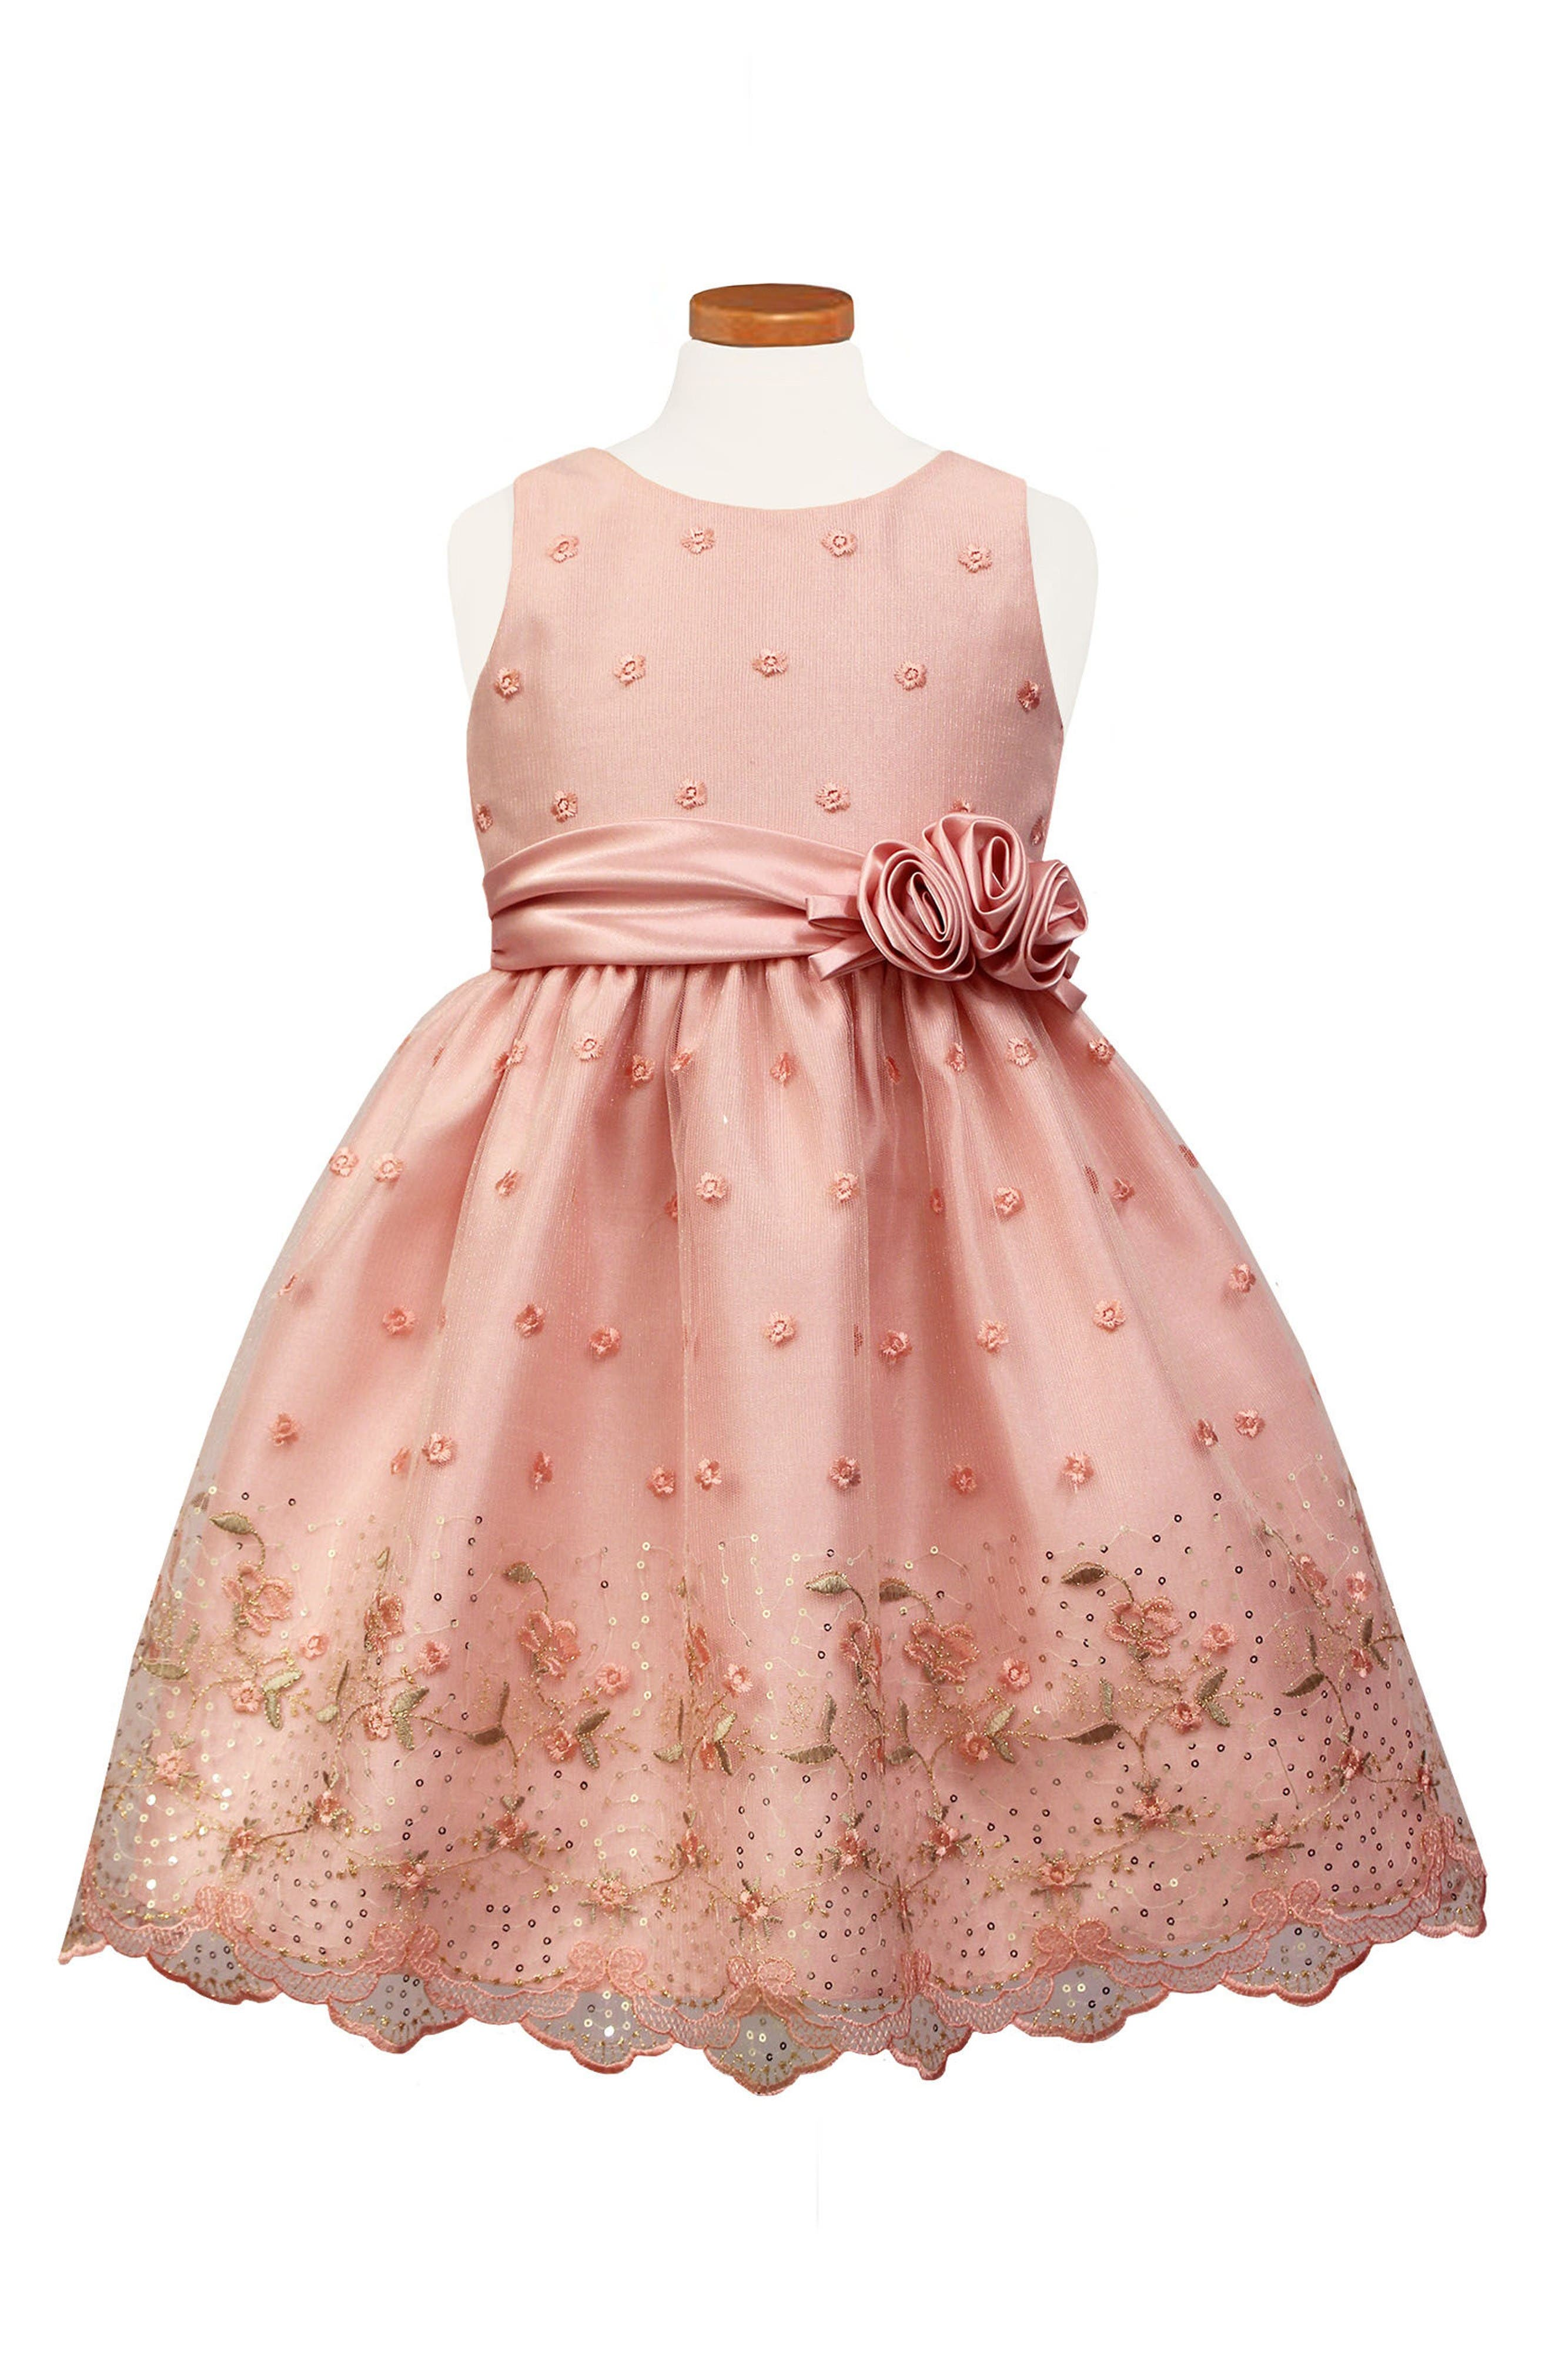 Sorbet Flower Embroidered Party Dress (Toddler Girls & Little Girls)